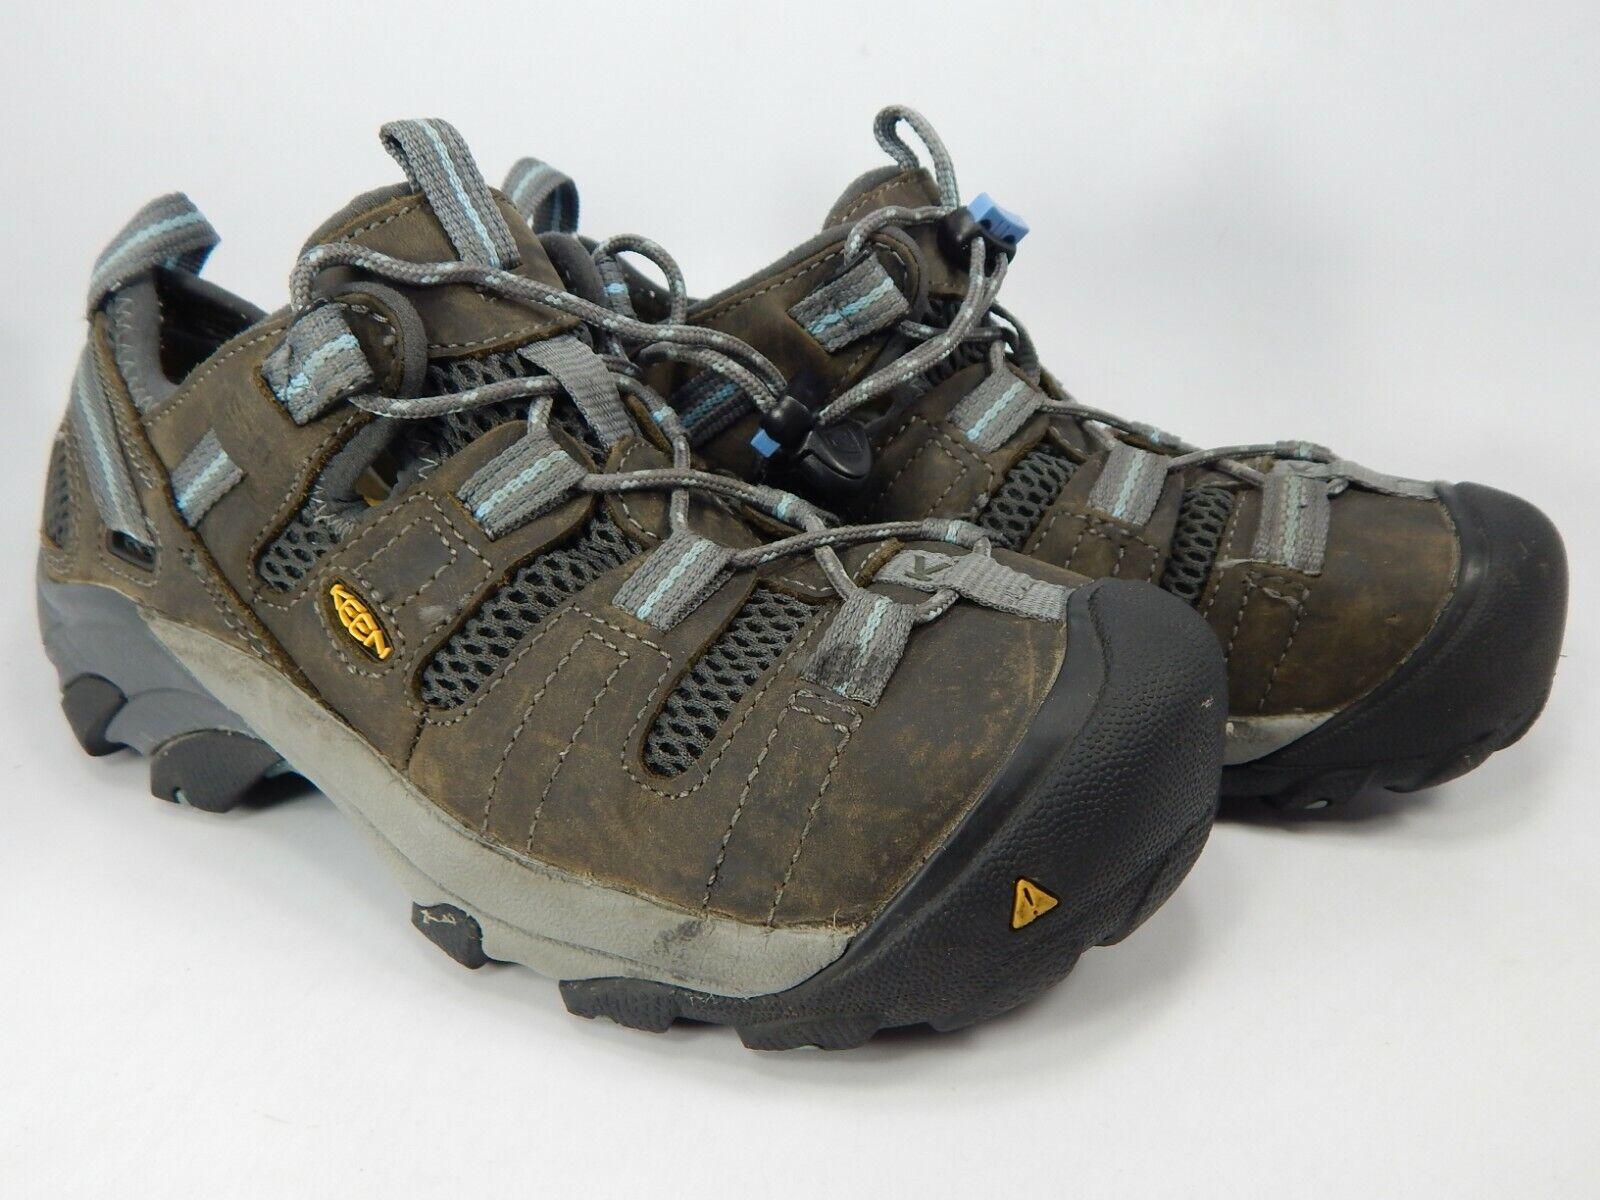 Keen Atlanta Cool ESD Size 7 M (B) EU 37.5 Women's Steel Toe Work shoes 1007017